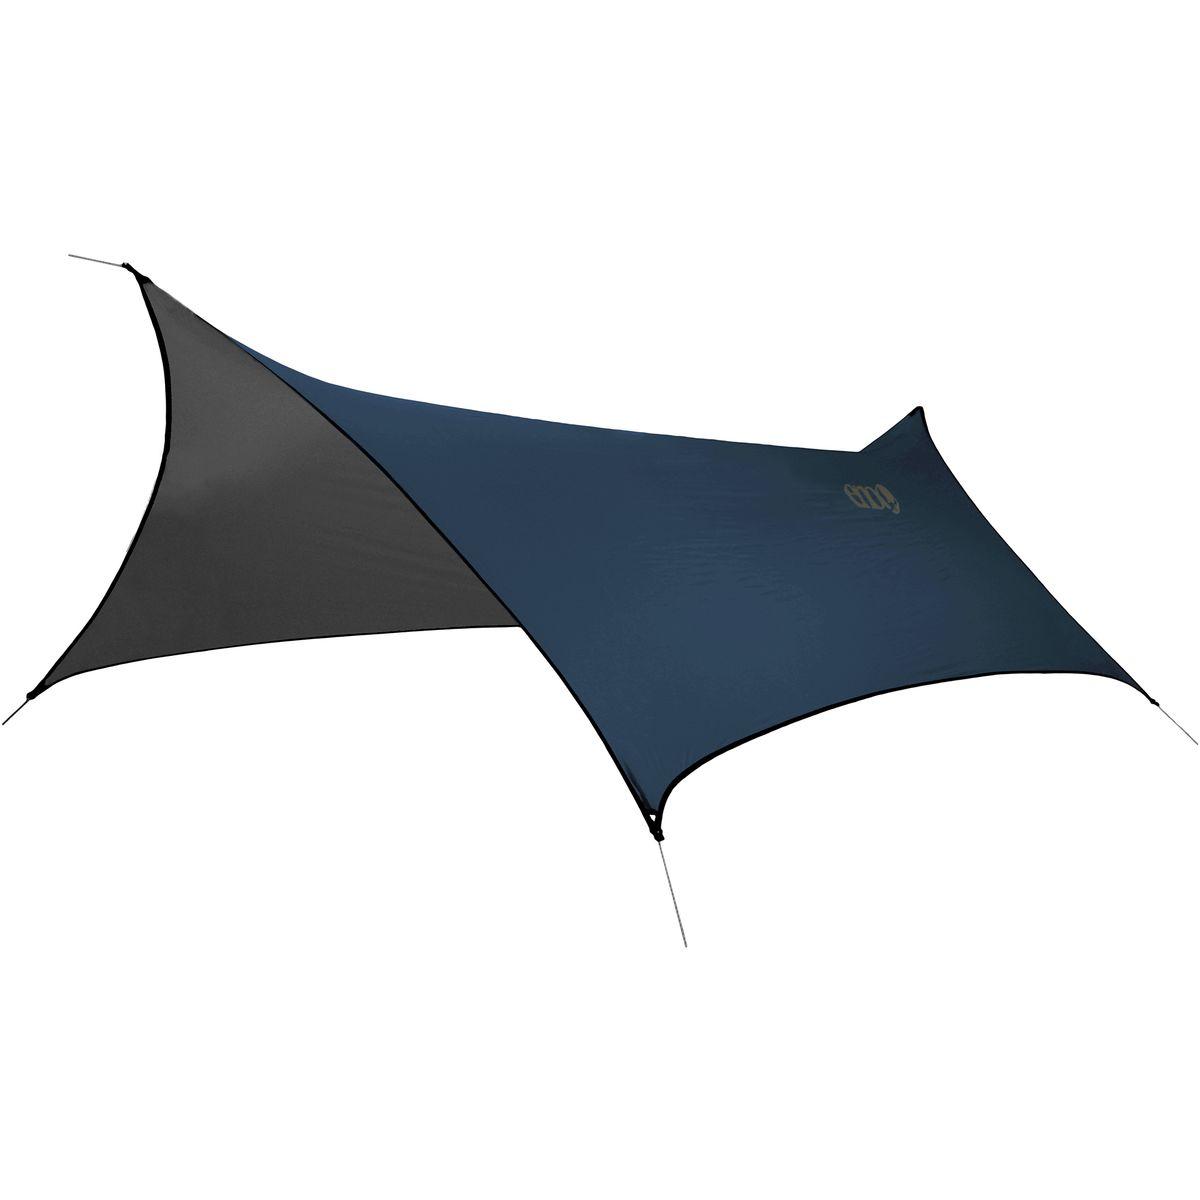 photo: Eagles Nest Outfitters ProFly XL Rain Tarp tarp/shelter